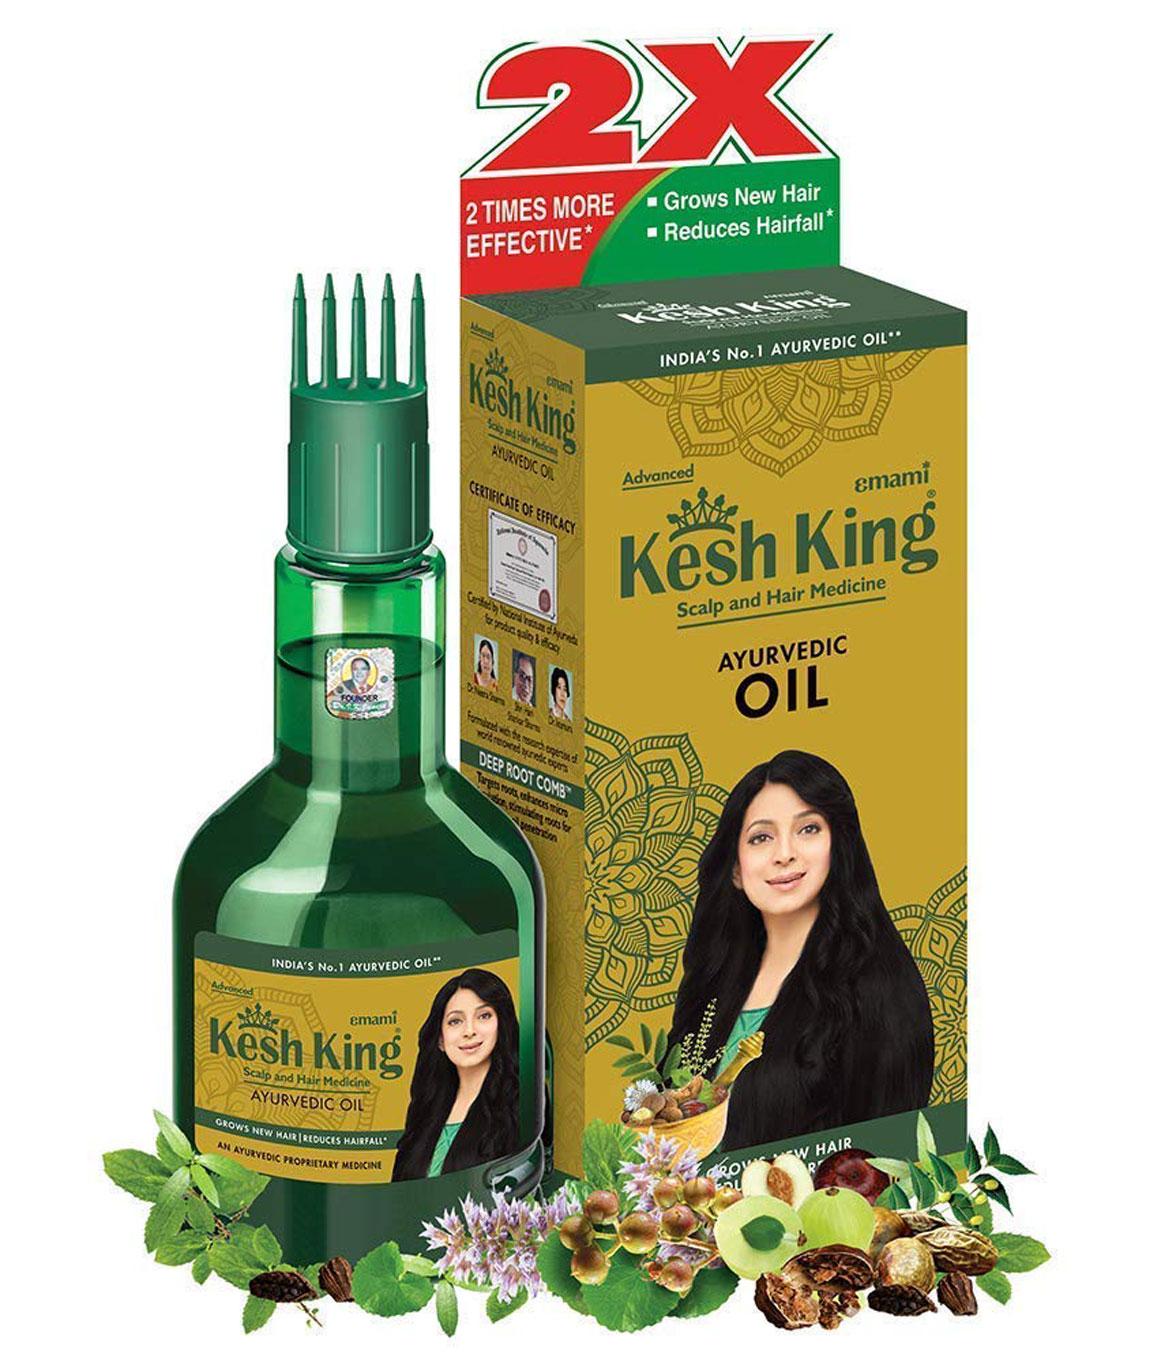 Kesh King Ayurvedic Scalp and Hair Oil, 60ml (60ml)